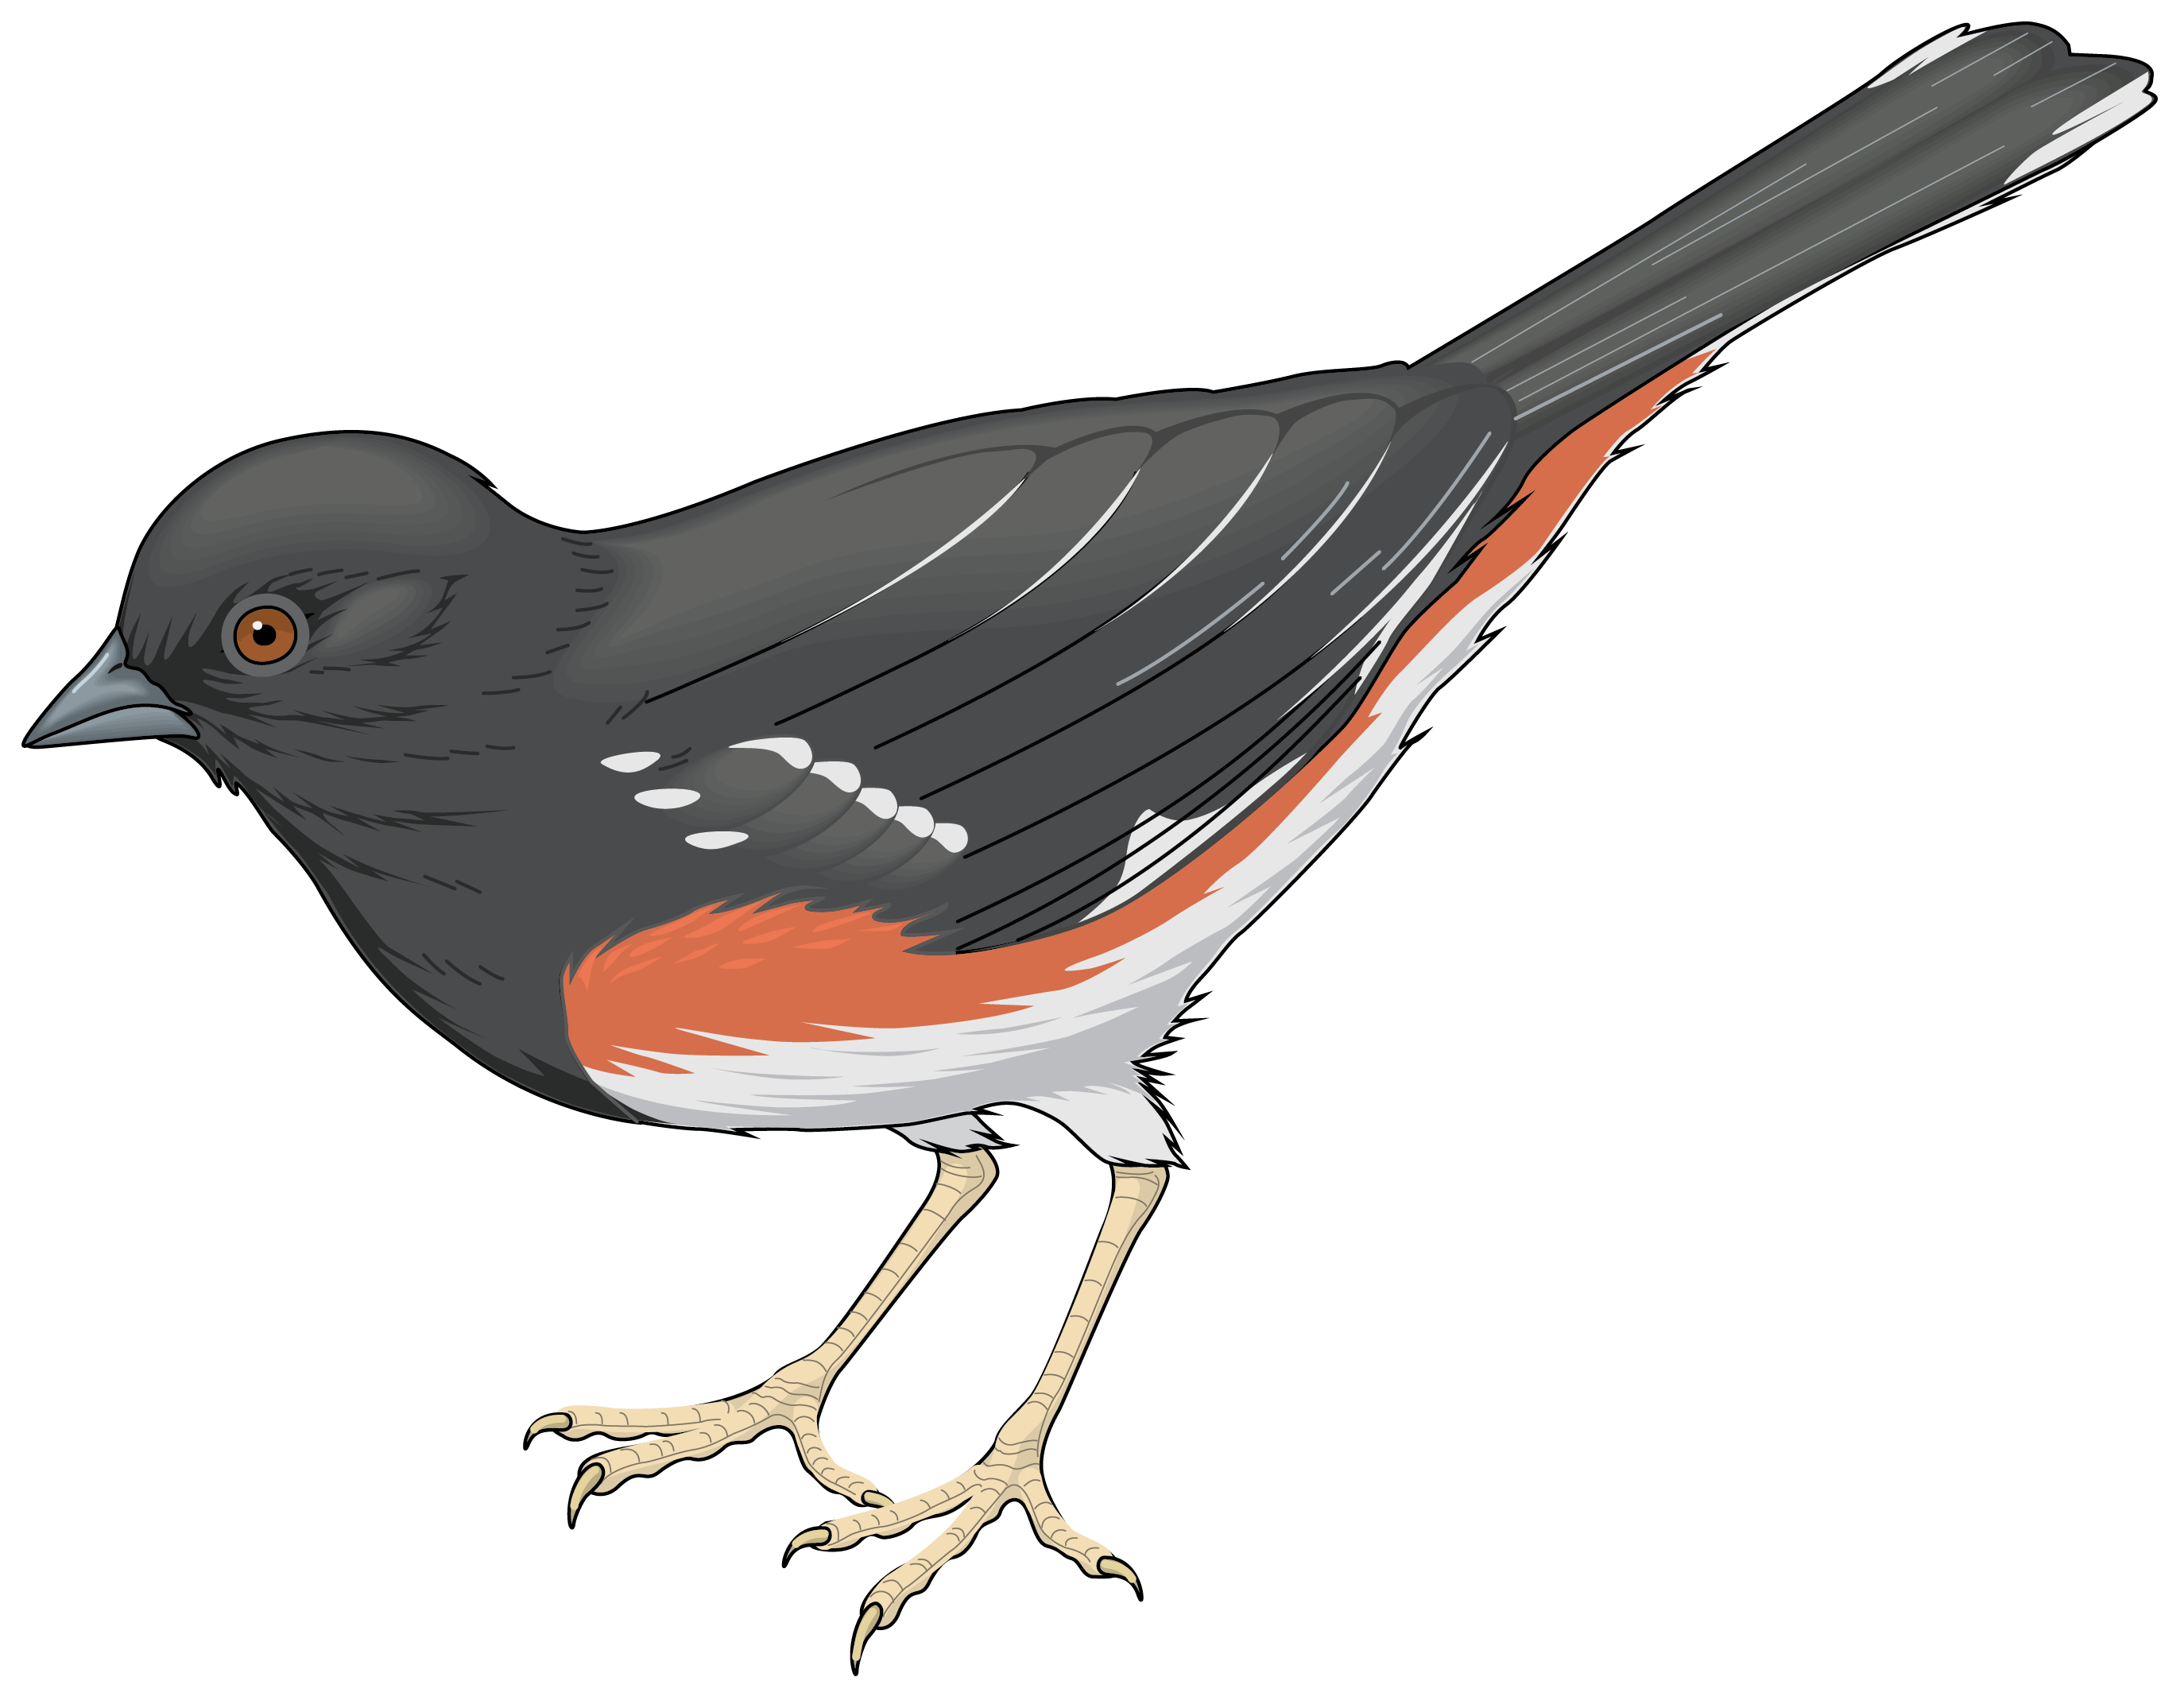 Grey bird png best. Clipart birds fish